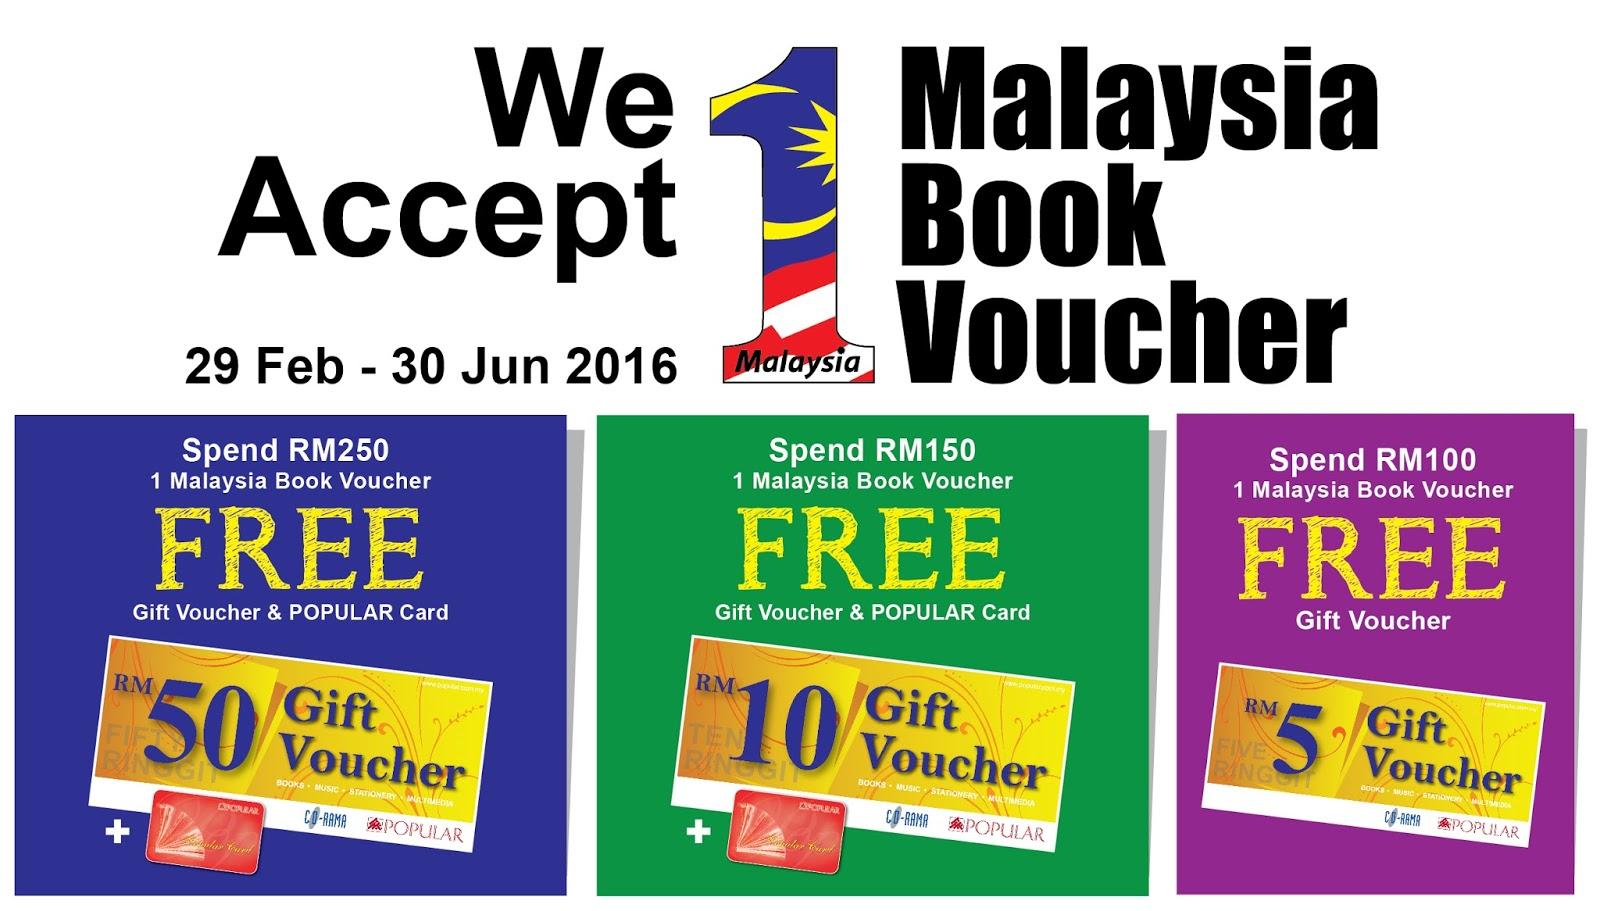 Popular Bookstore 1malaysia Book Voucher Bb1m Promotion 29